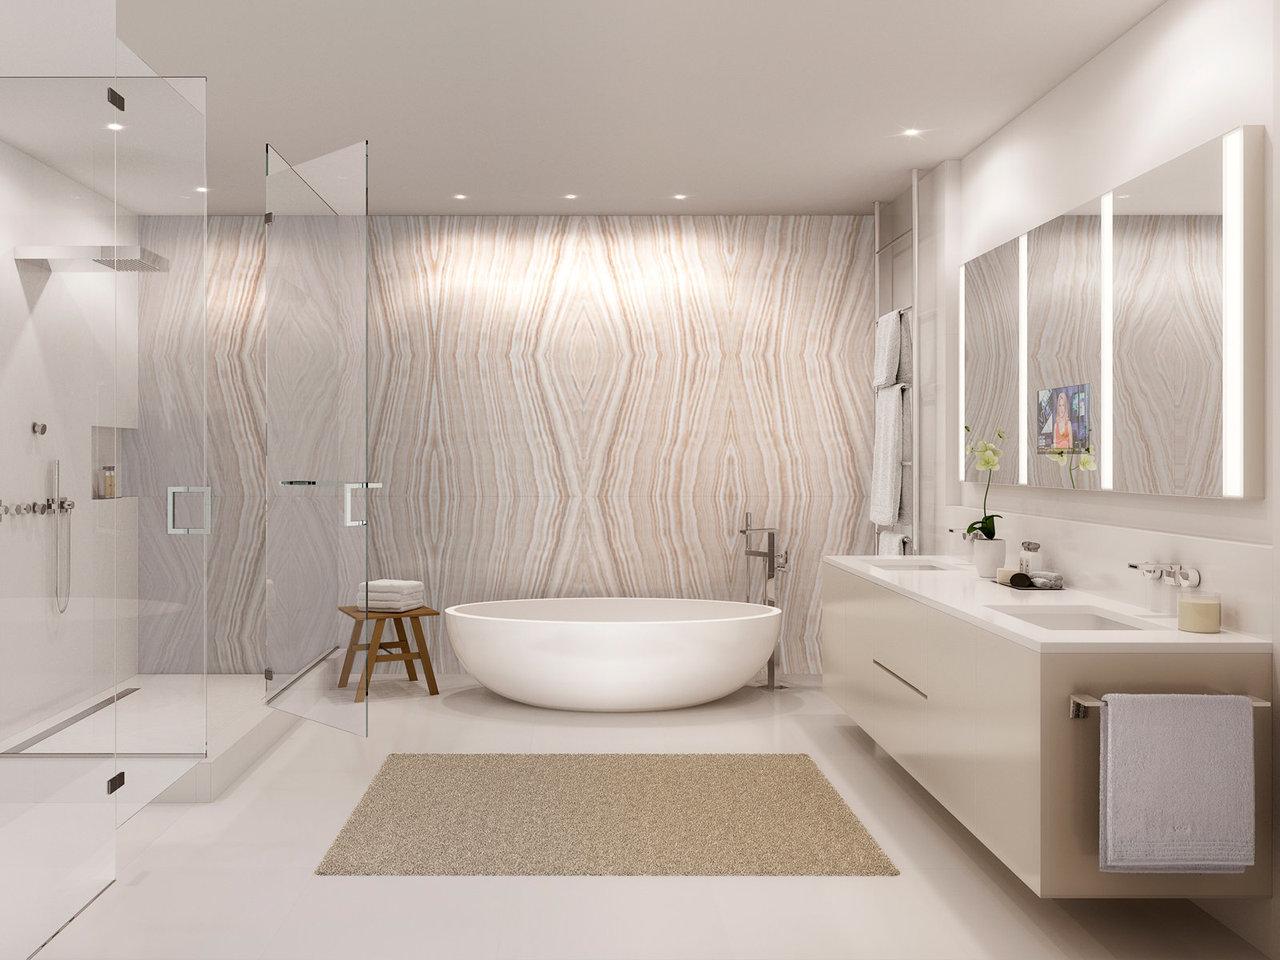 Waiea Bath